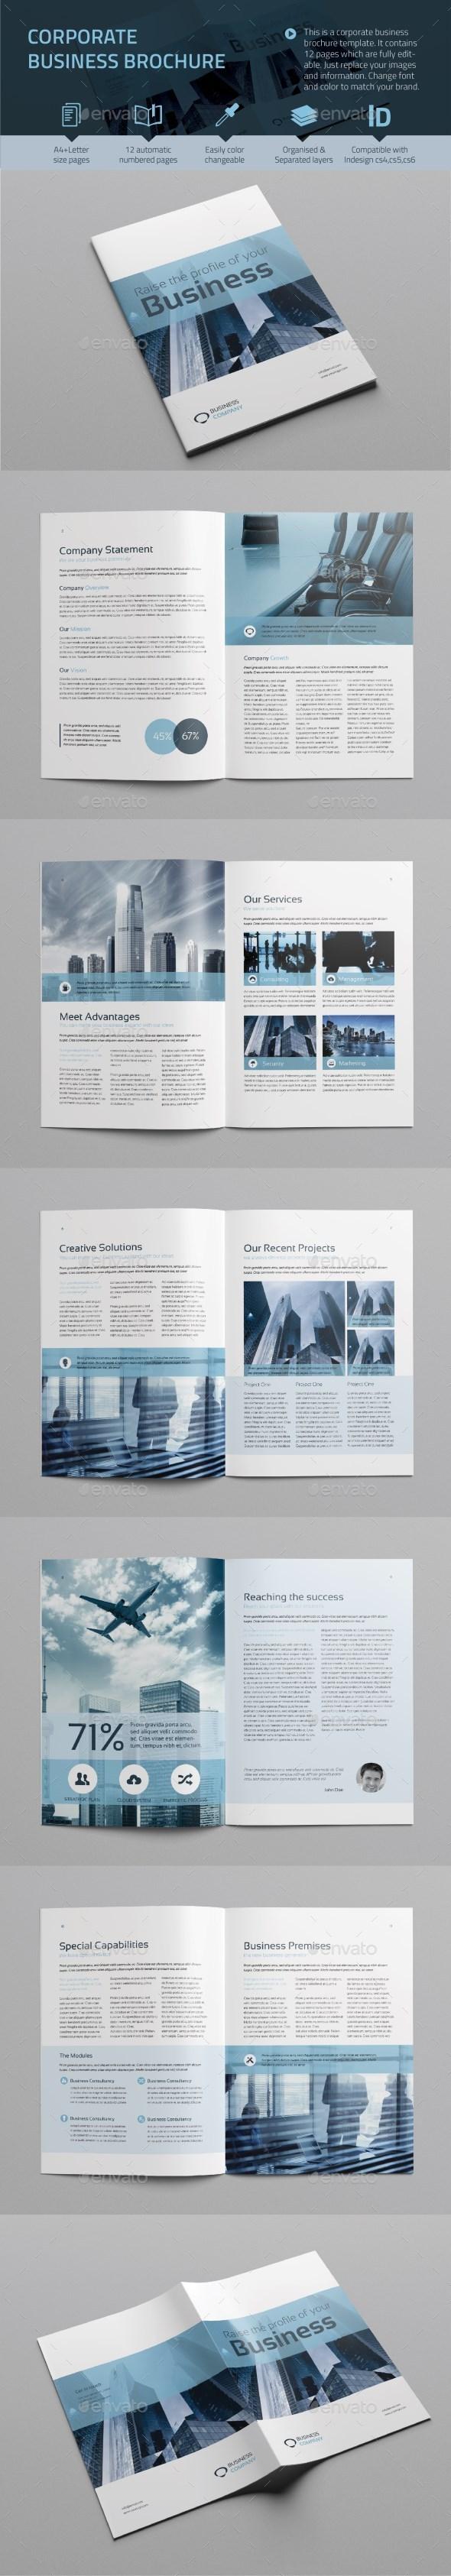 GraphicRiver Corporate Business Brochure vol.3 9235634